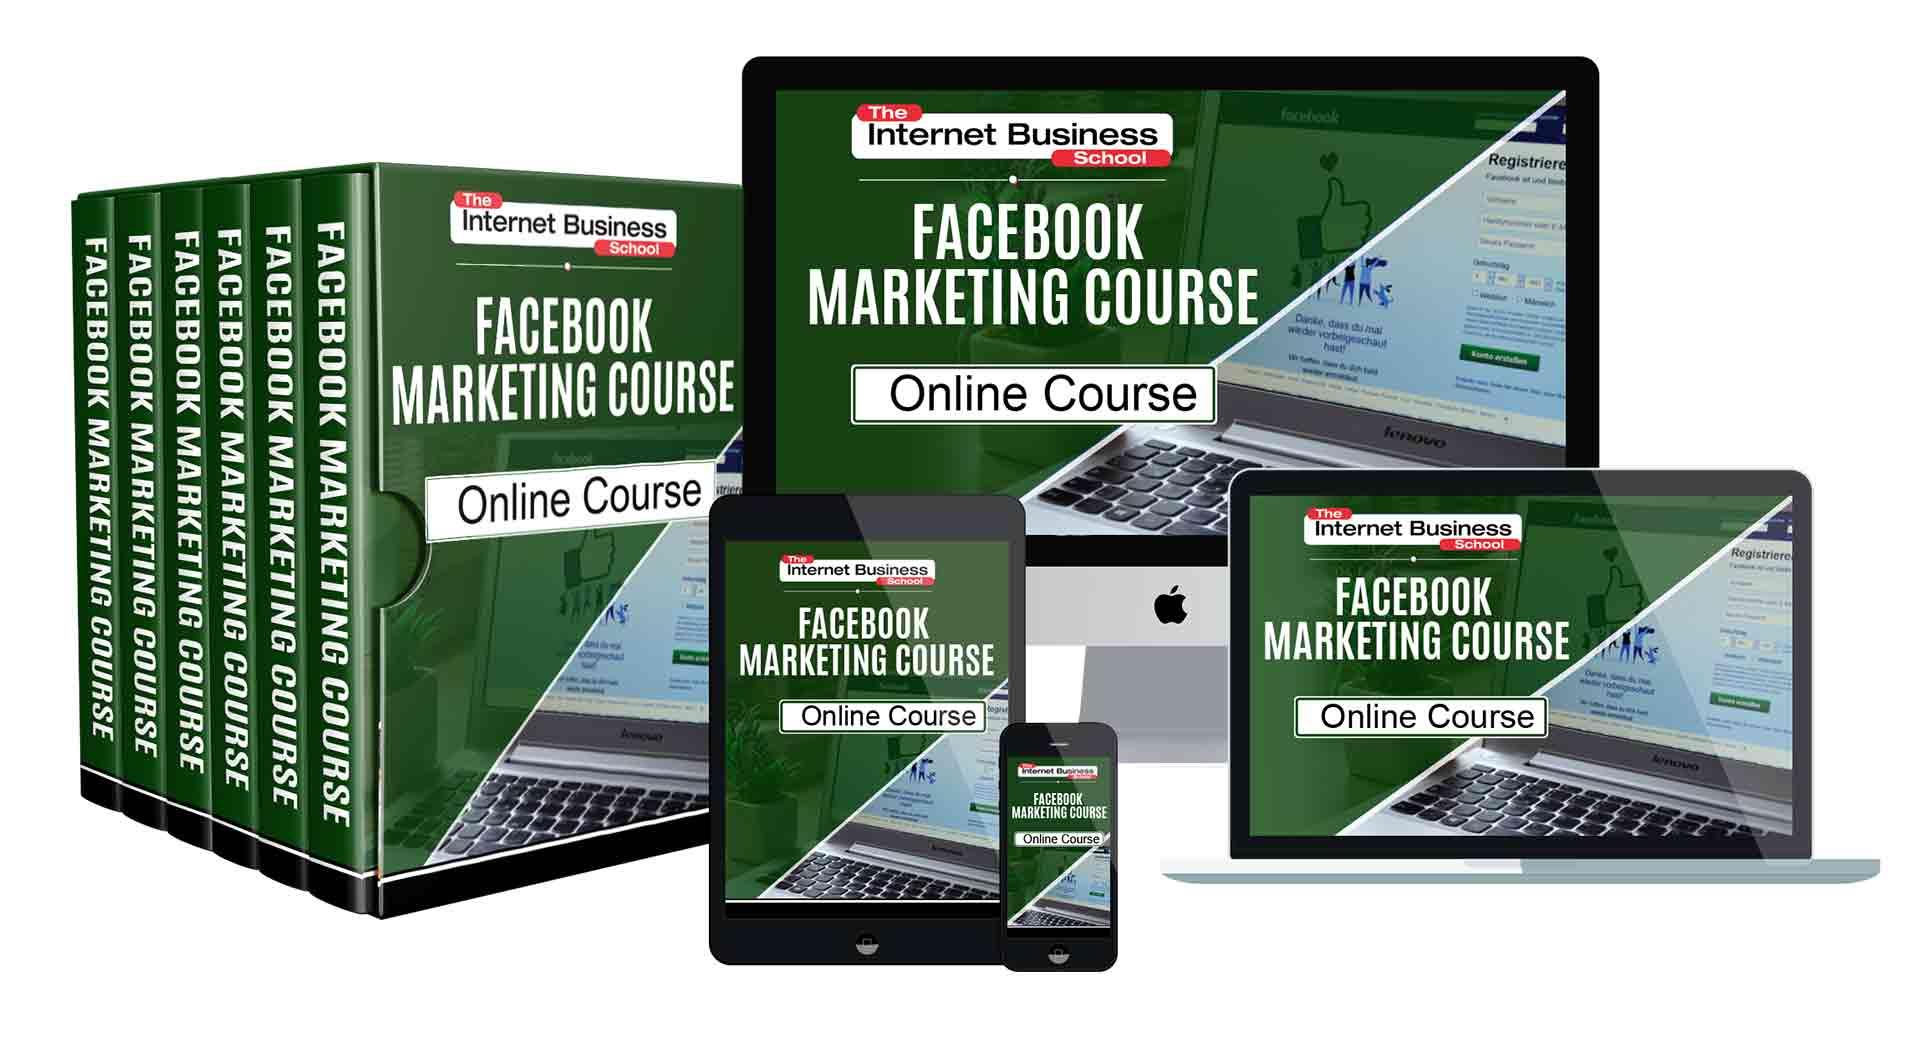 Facebook Marketing Course - Cotswold Websites